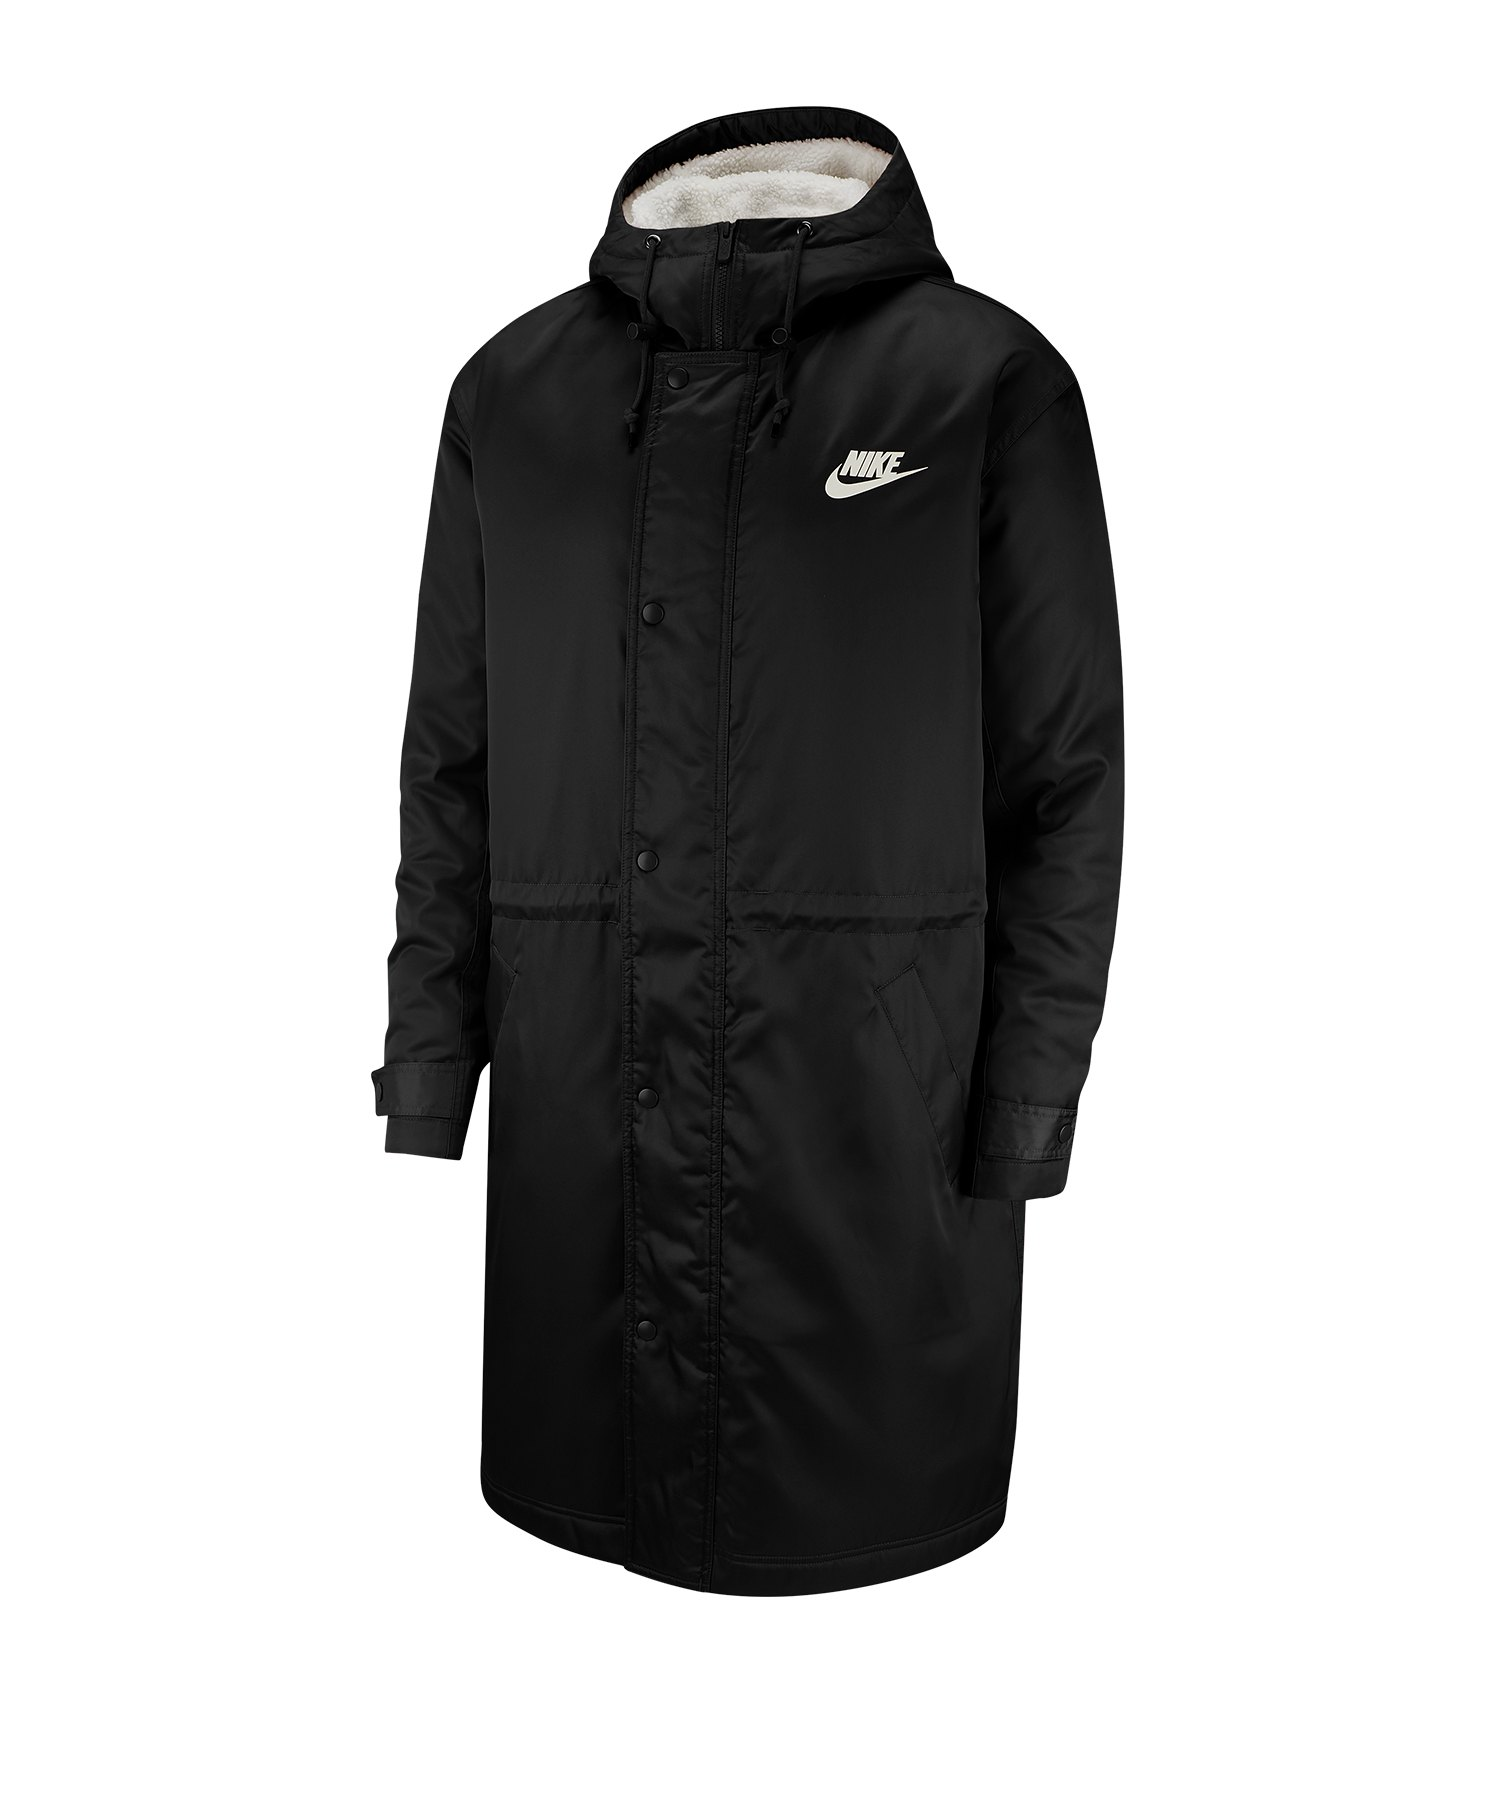 Nike Winterparka Schwarz F010 - schwarz